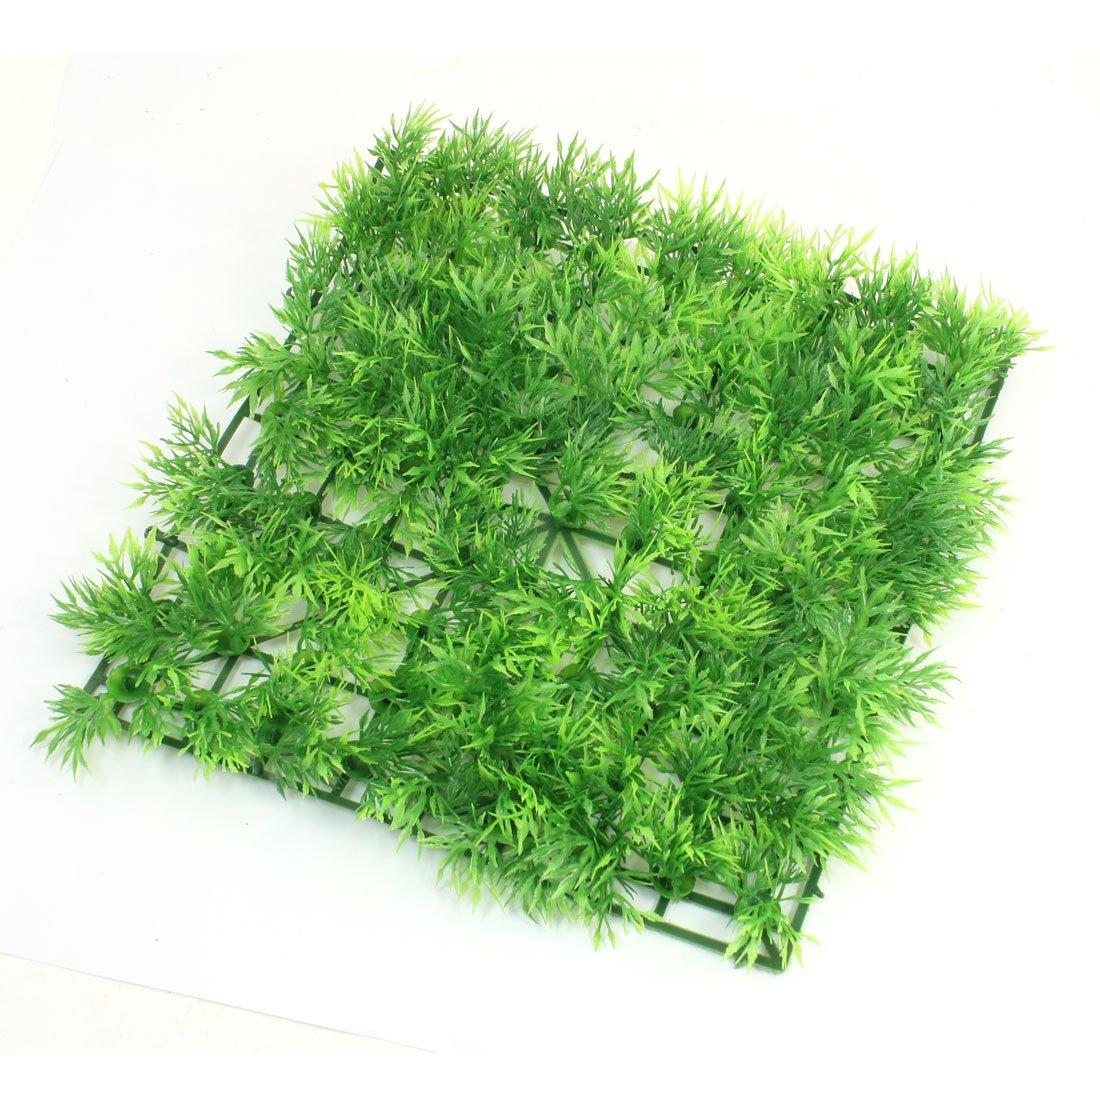 uxcell 人工水草 水槽用 アクアリウム 装飾 グリーン プラスチック グラス 人造 ローン 25 x 25cm B006W2HZ9O type1 type1